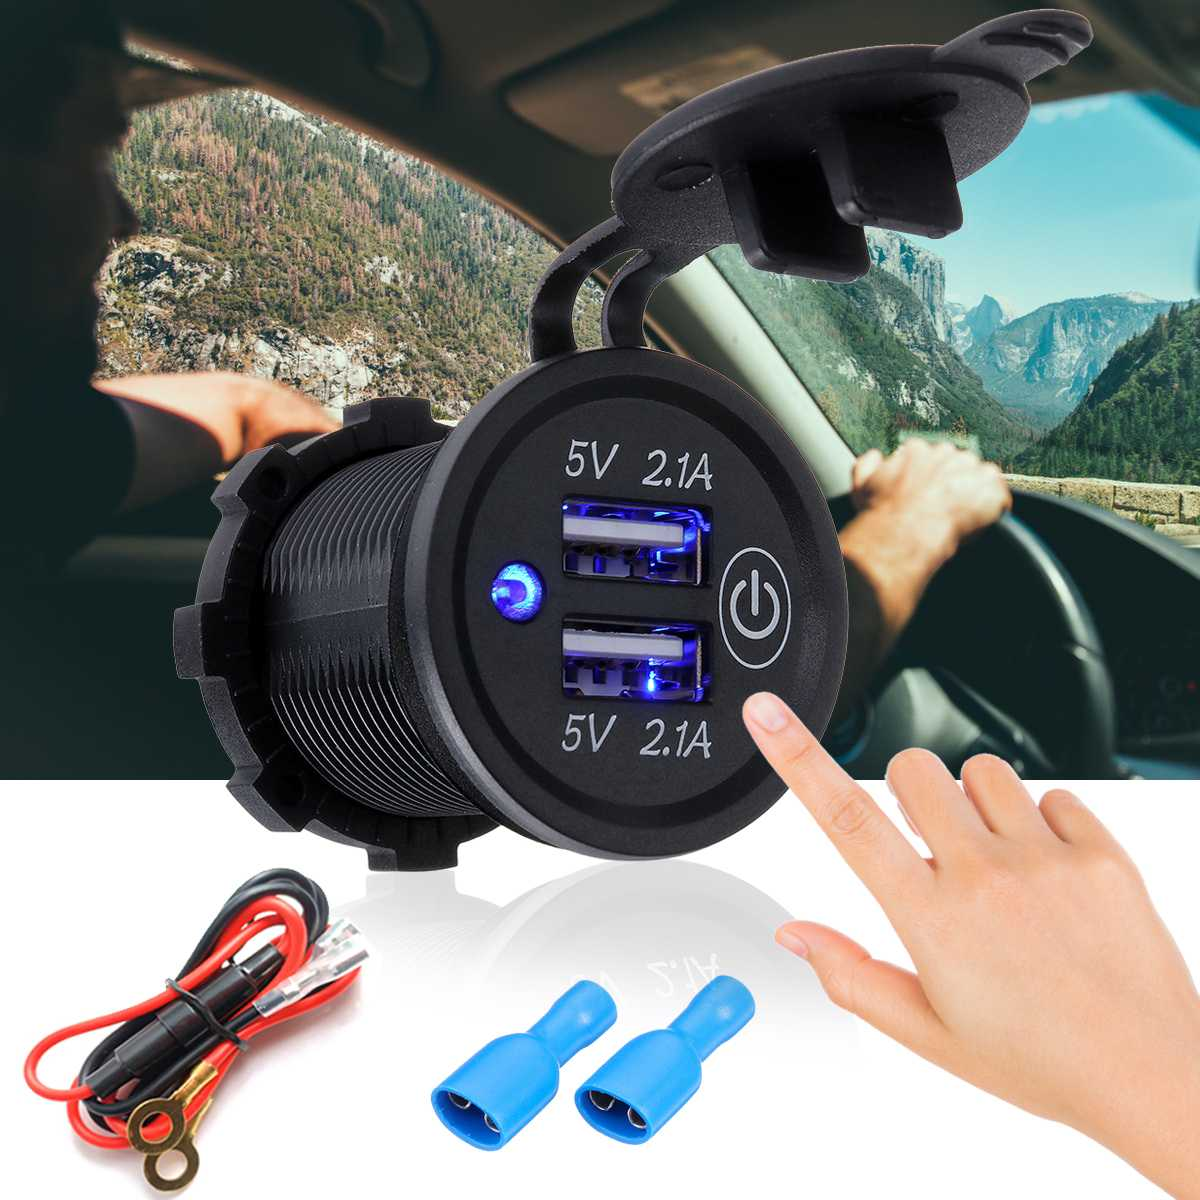 Puerto USB Dual para encendedor de cigarrillos, divisor de enchufe DC 12-24V 4.2A, cargador de coche, encendedor de cigarrillos, adaptador de corriente con luz LED